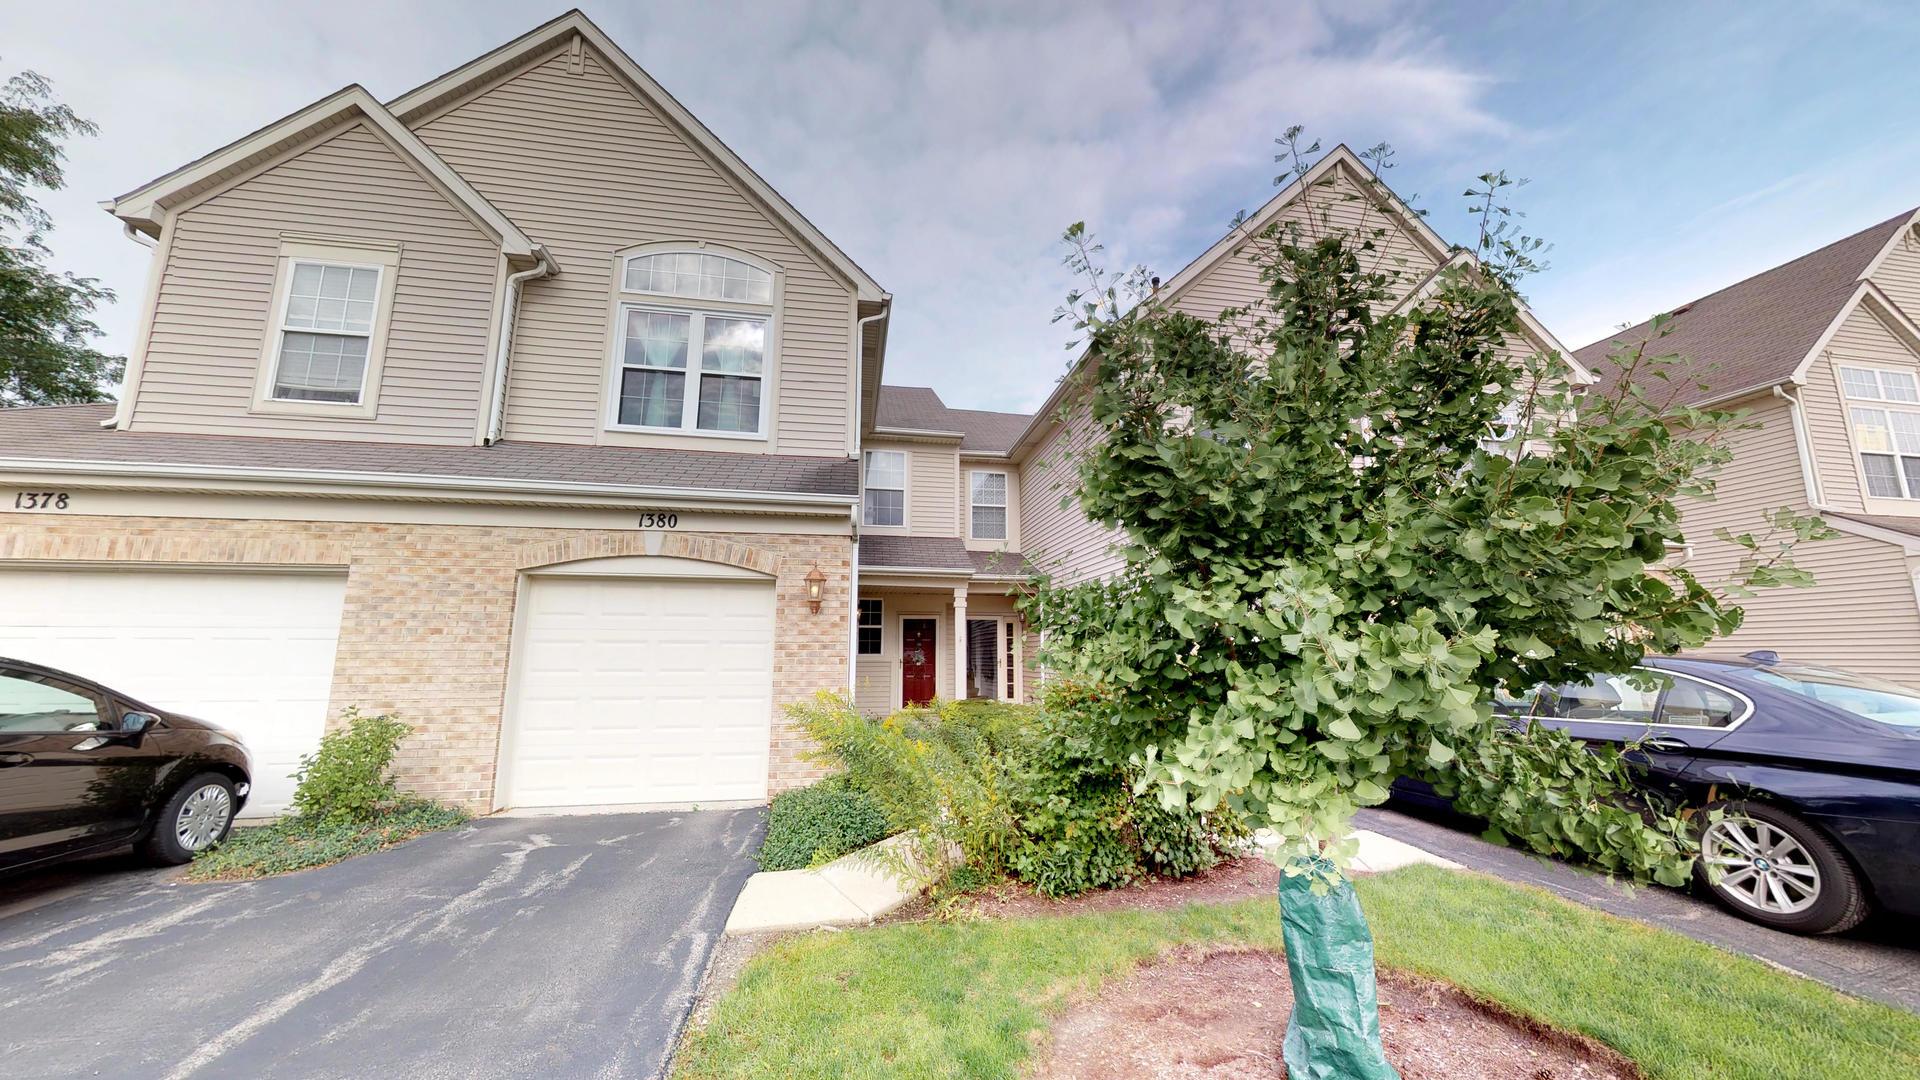 1380 Redbridge Court, Grayslake, Illinois 60030